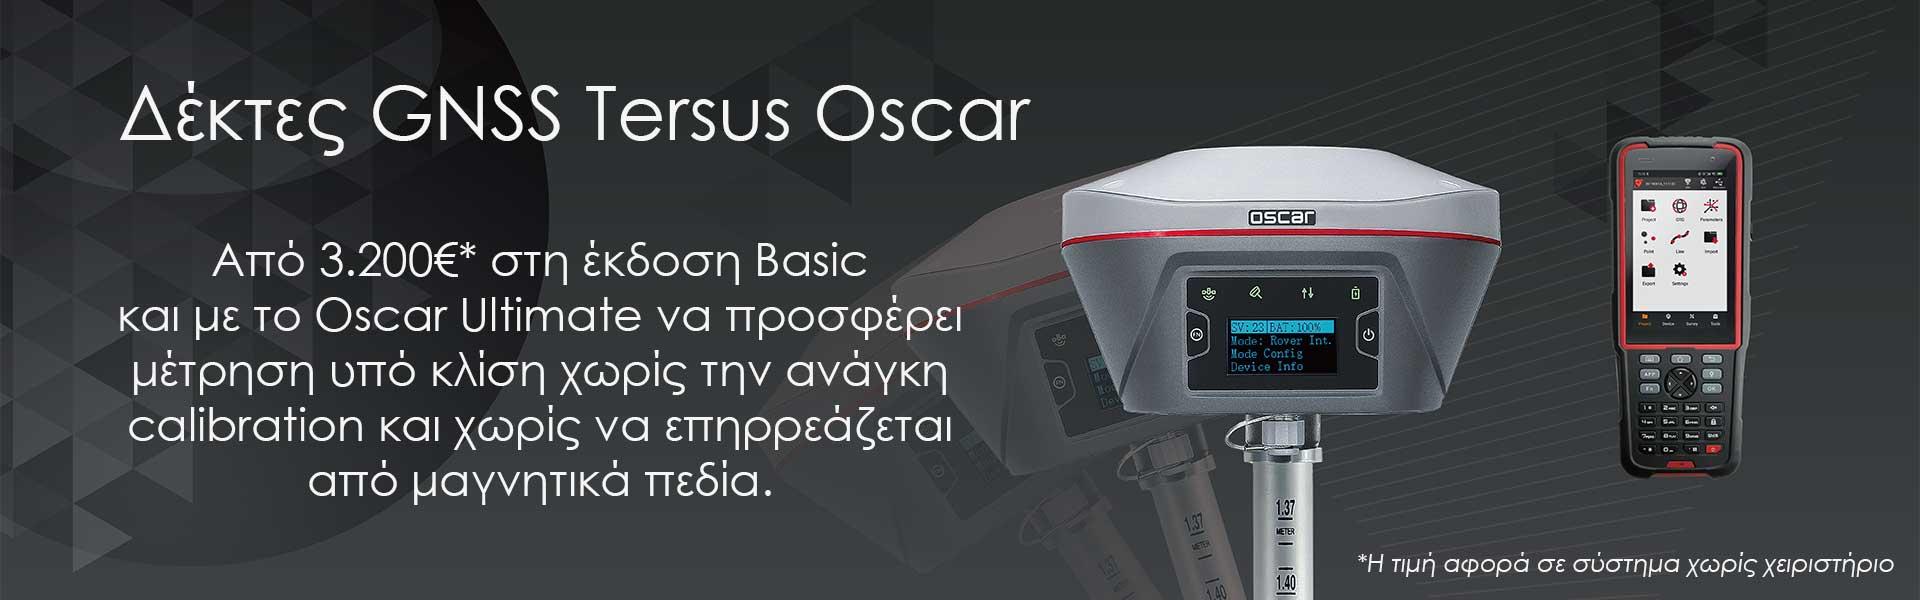 Tersus Orcar GNSS